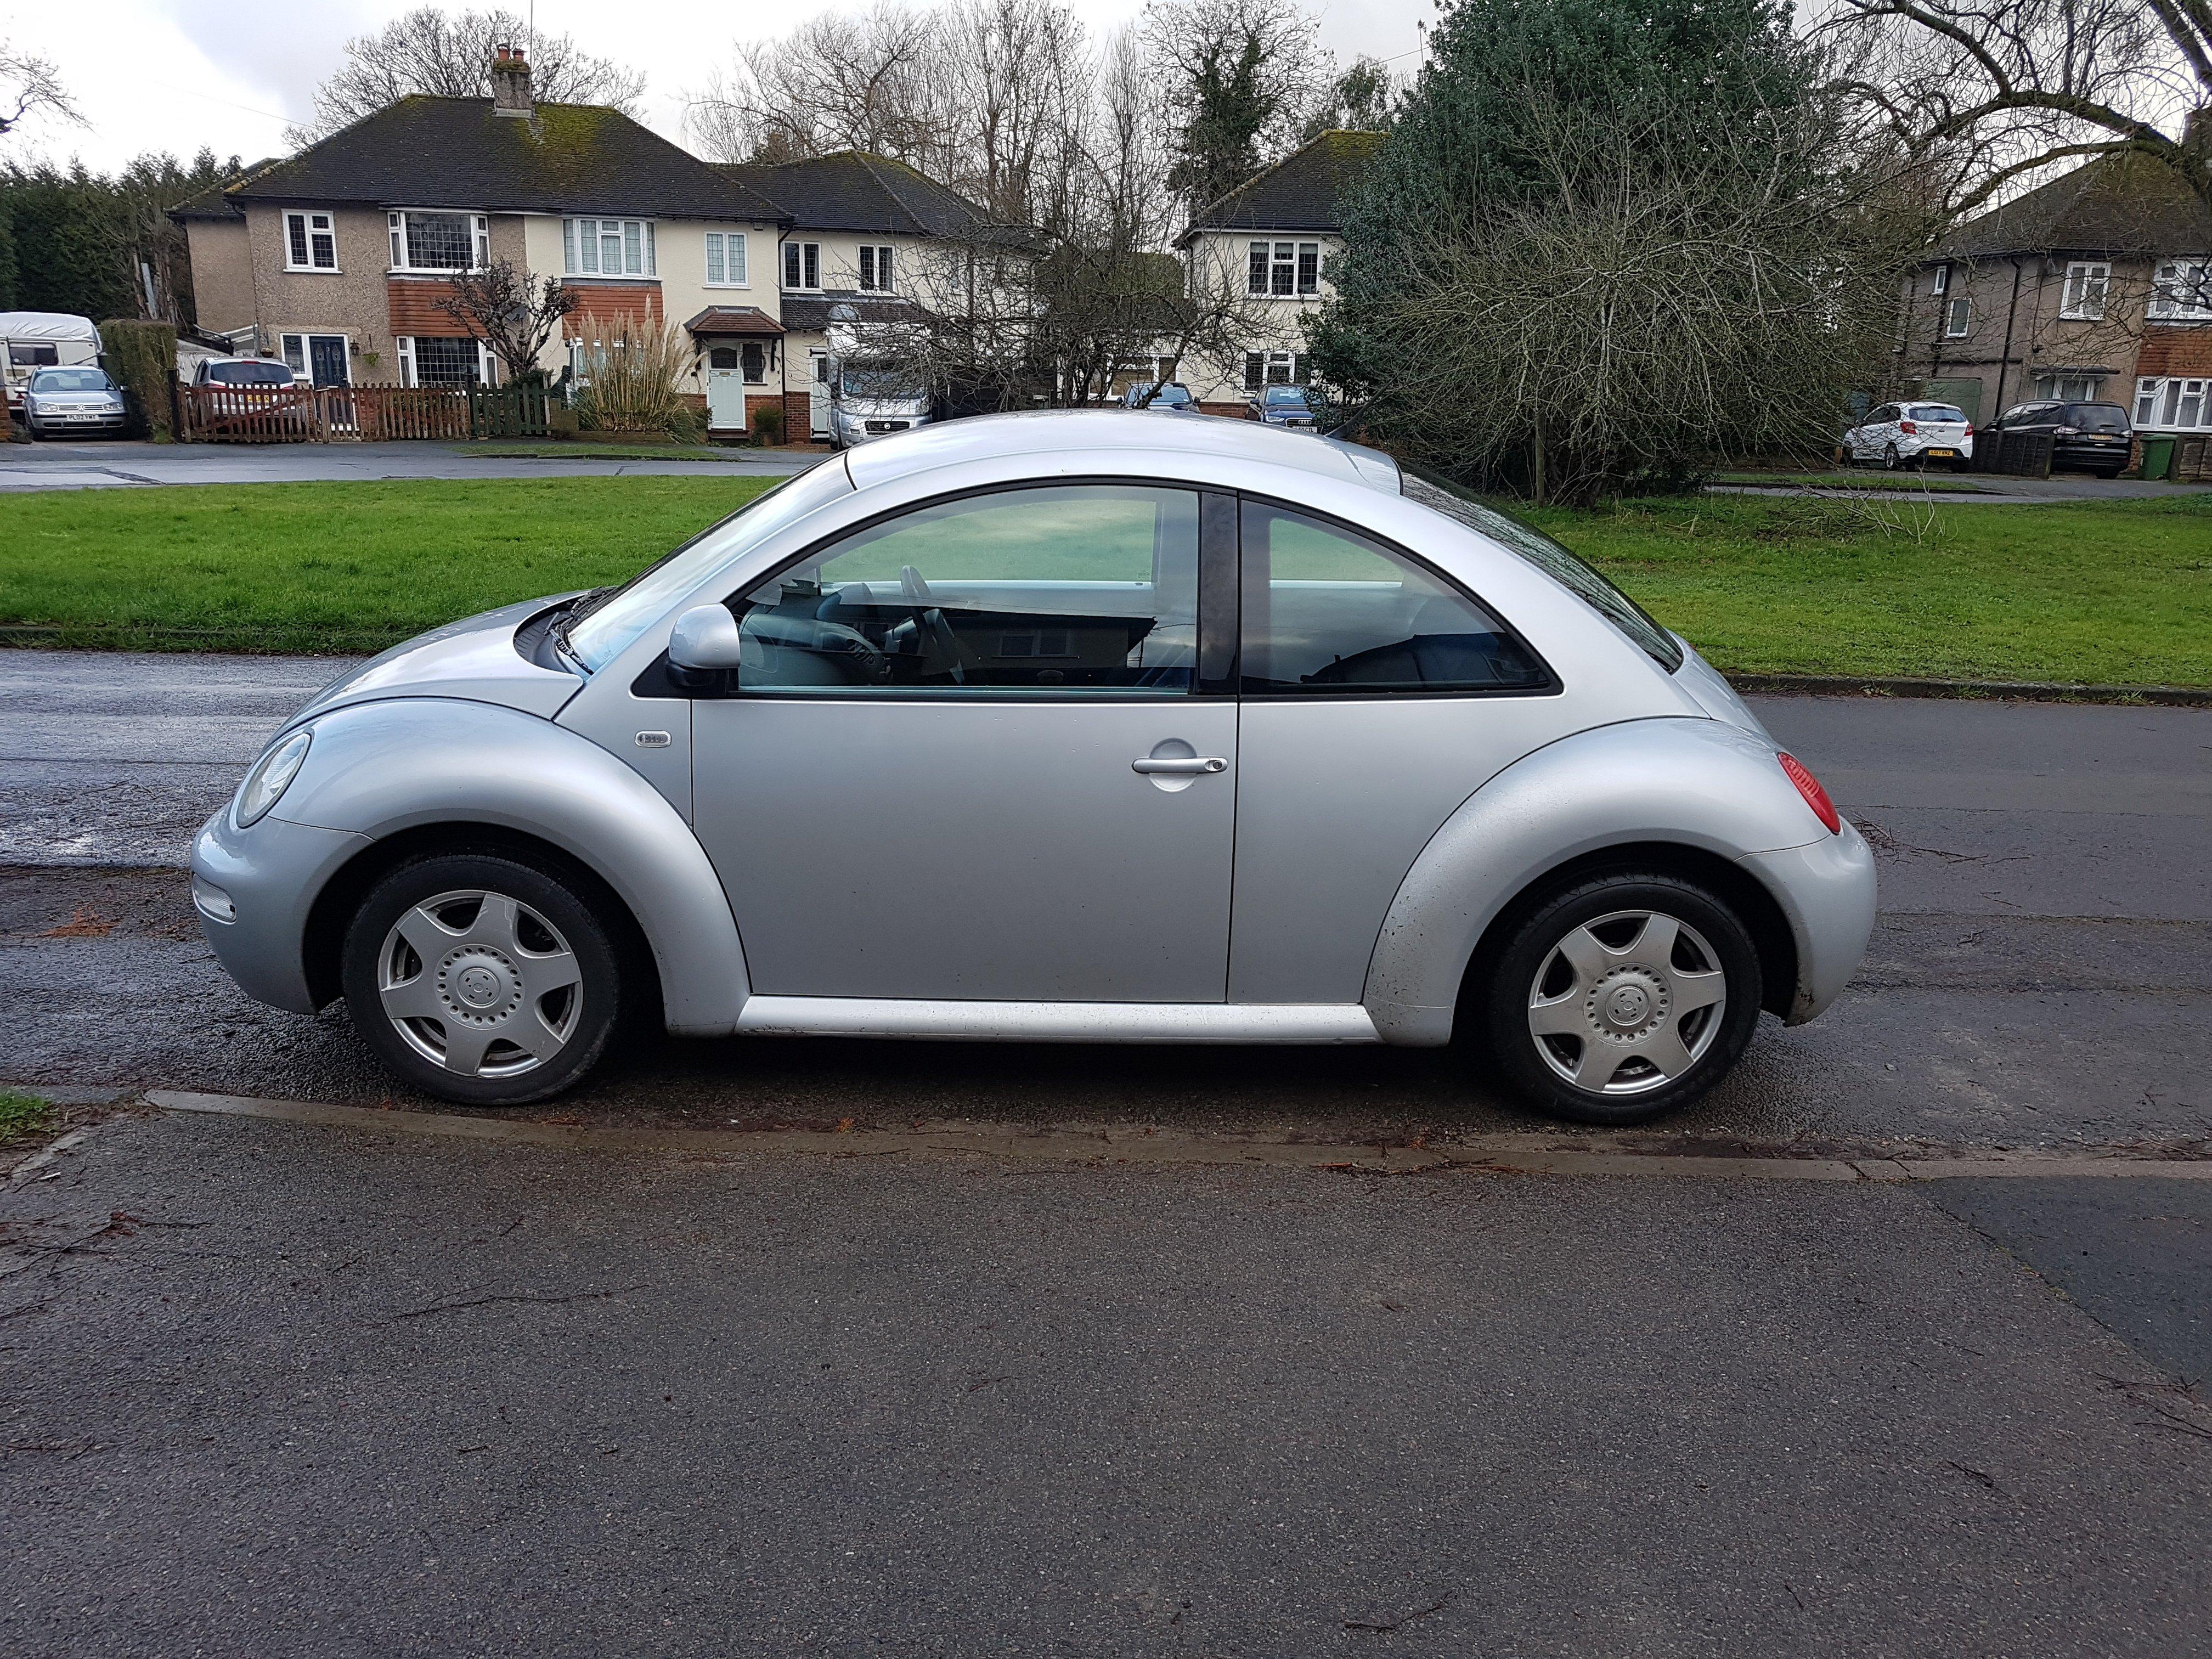 Vw beetle fresh mot